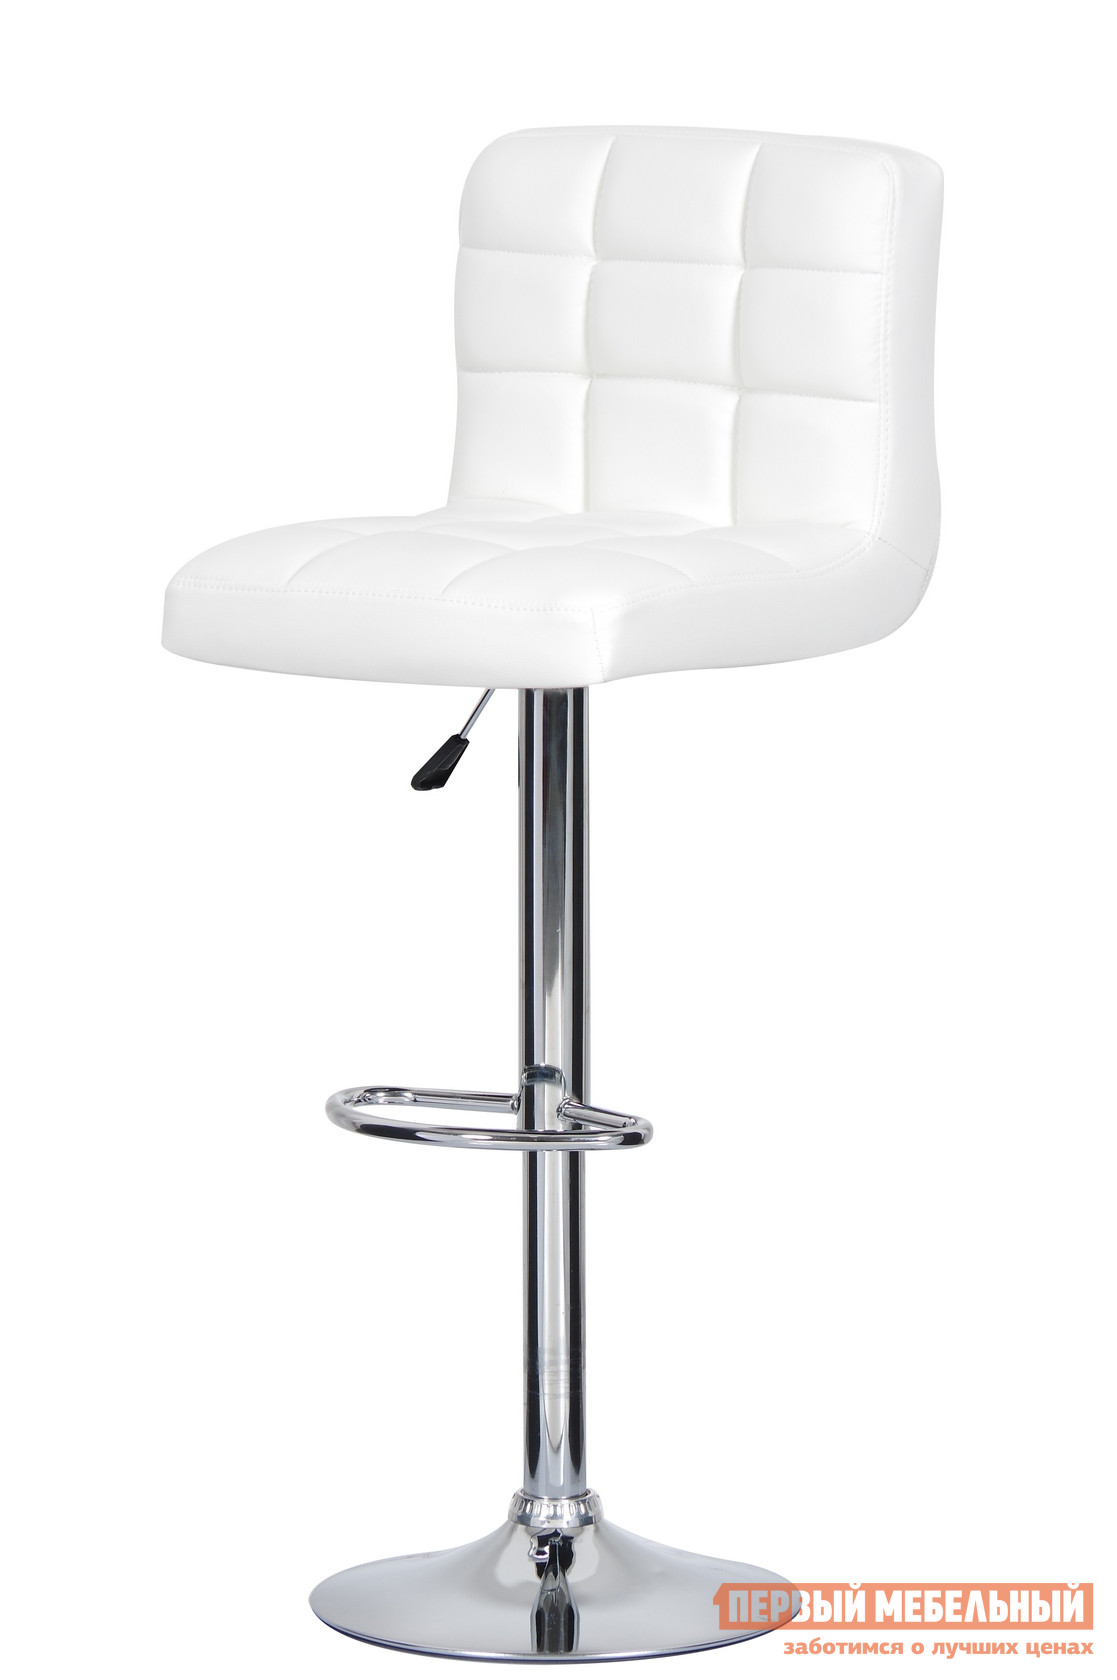 Барный стул Паоли Kruger Original T-808H White кожзам